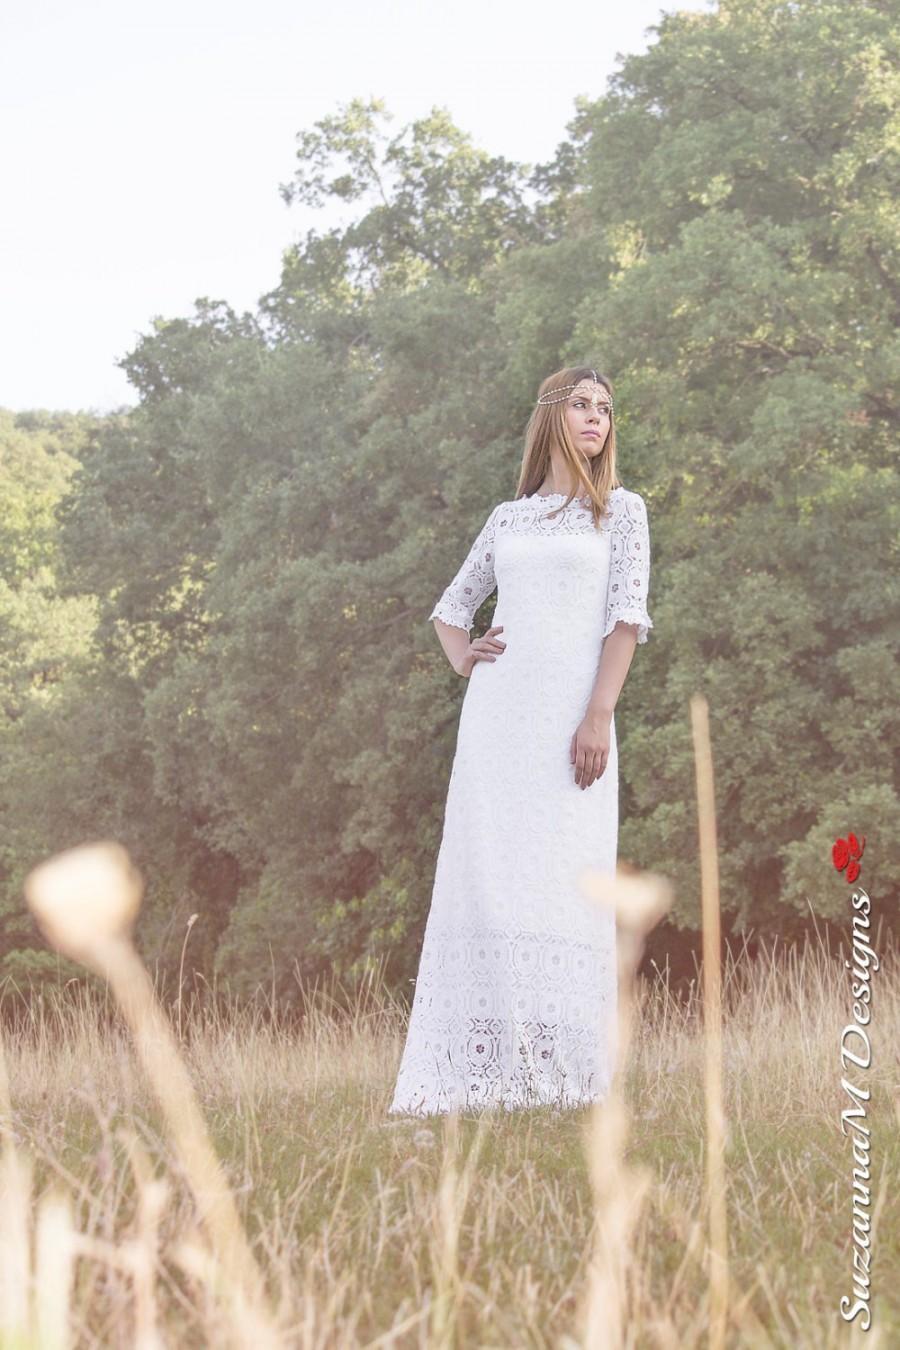 زفاف - Wedding Dress, Long Bridal Gown, 70s Bridal Dress, Bell Sleeve Dress, Long Sleeve Wedding Dress,Open Back Bridal Dress by SuzannaM Designs